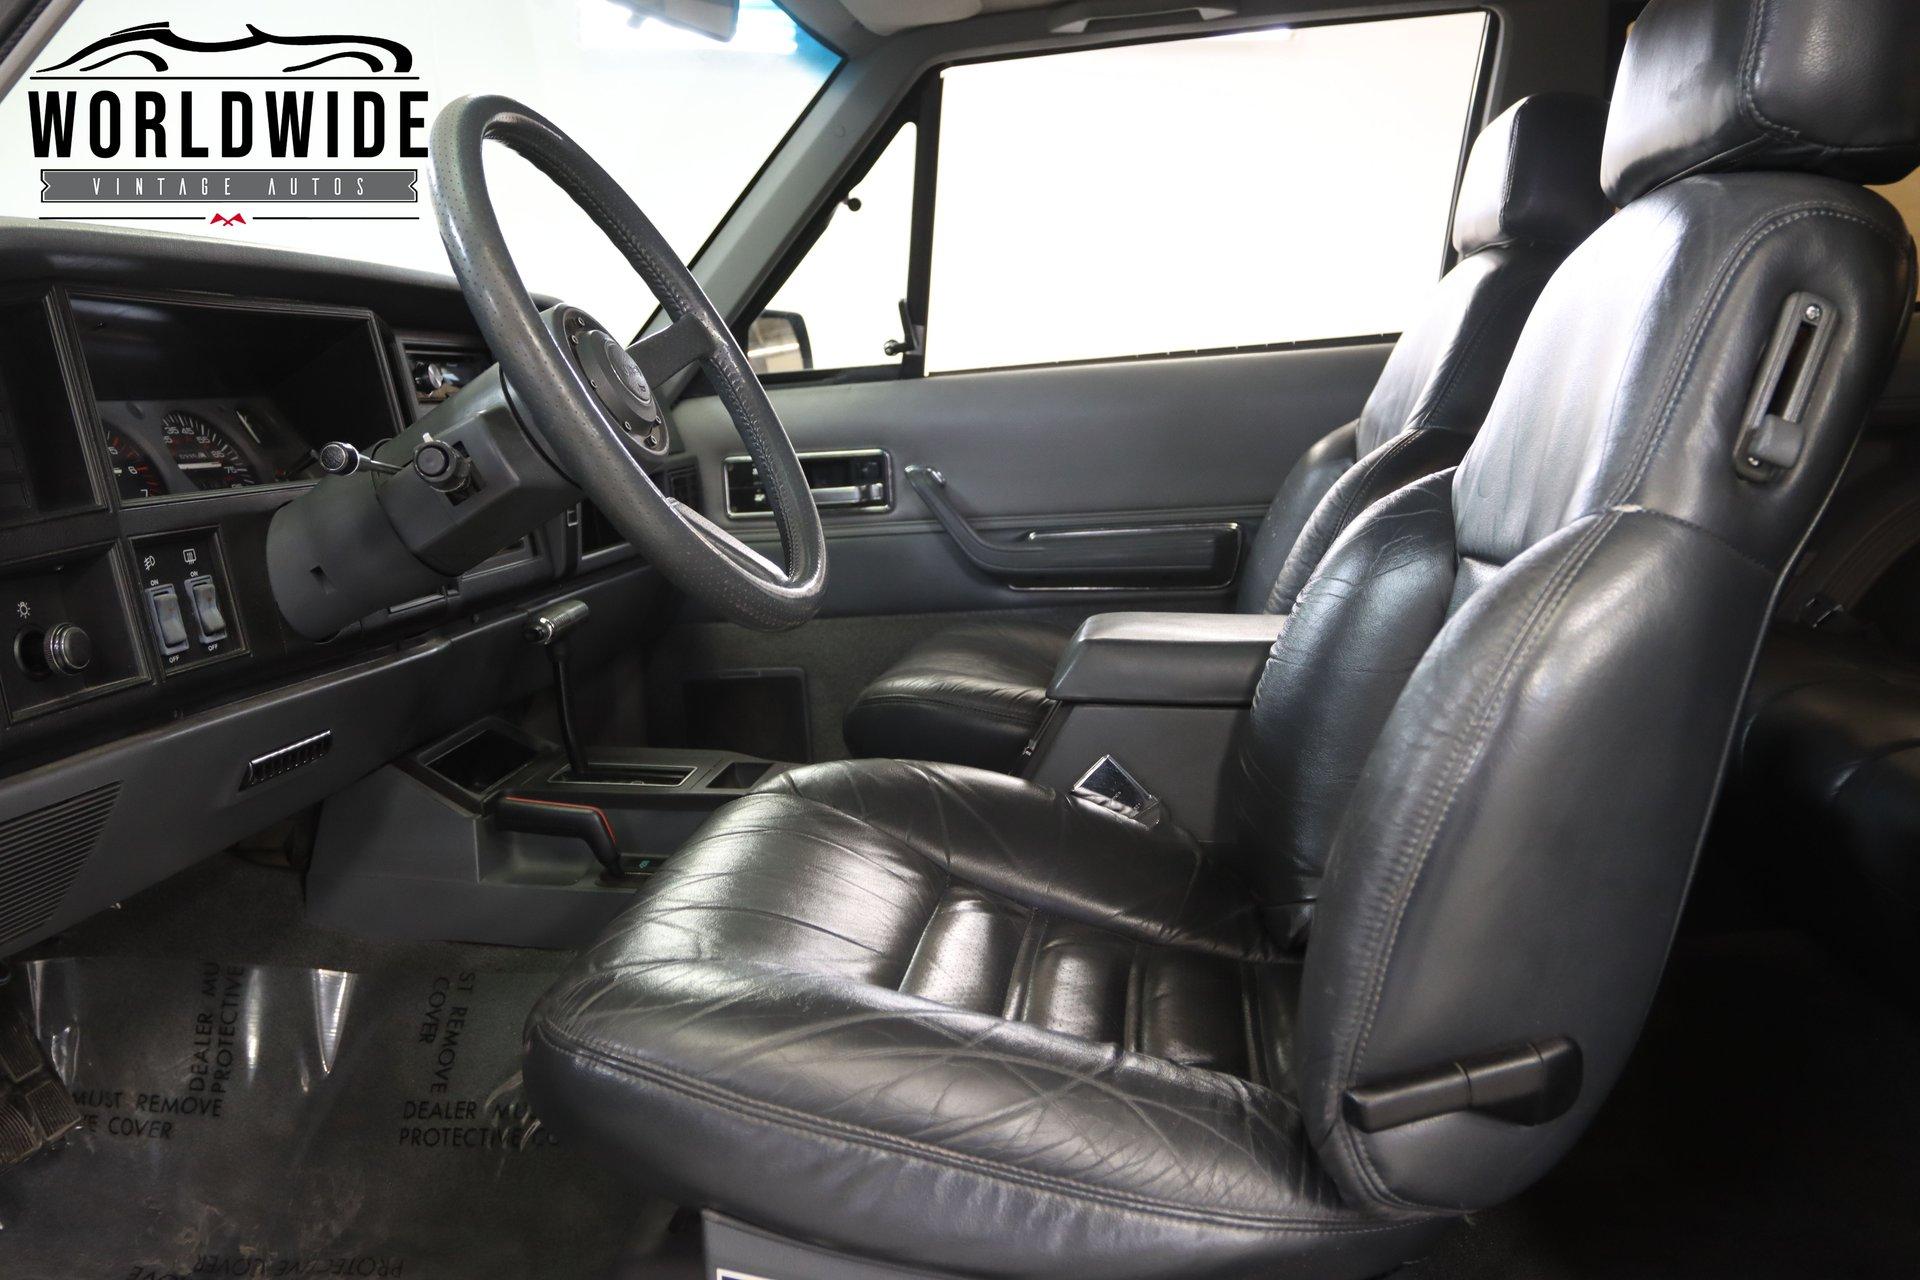 1988 Jeep Cherokee Limited